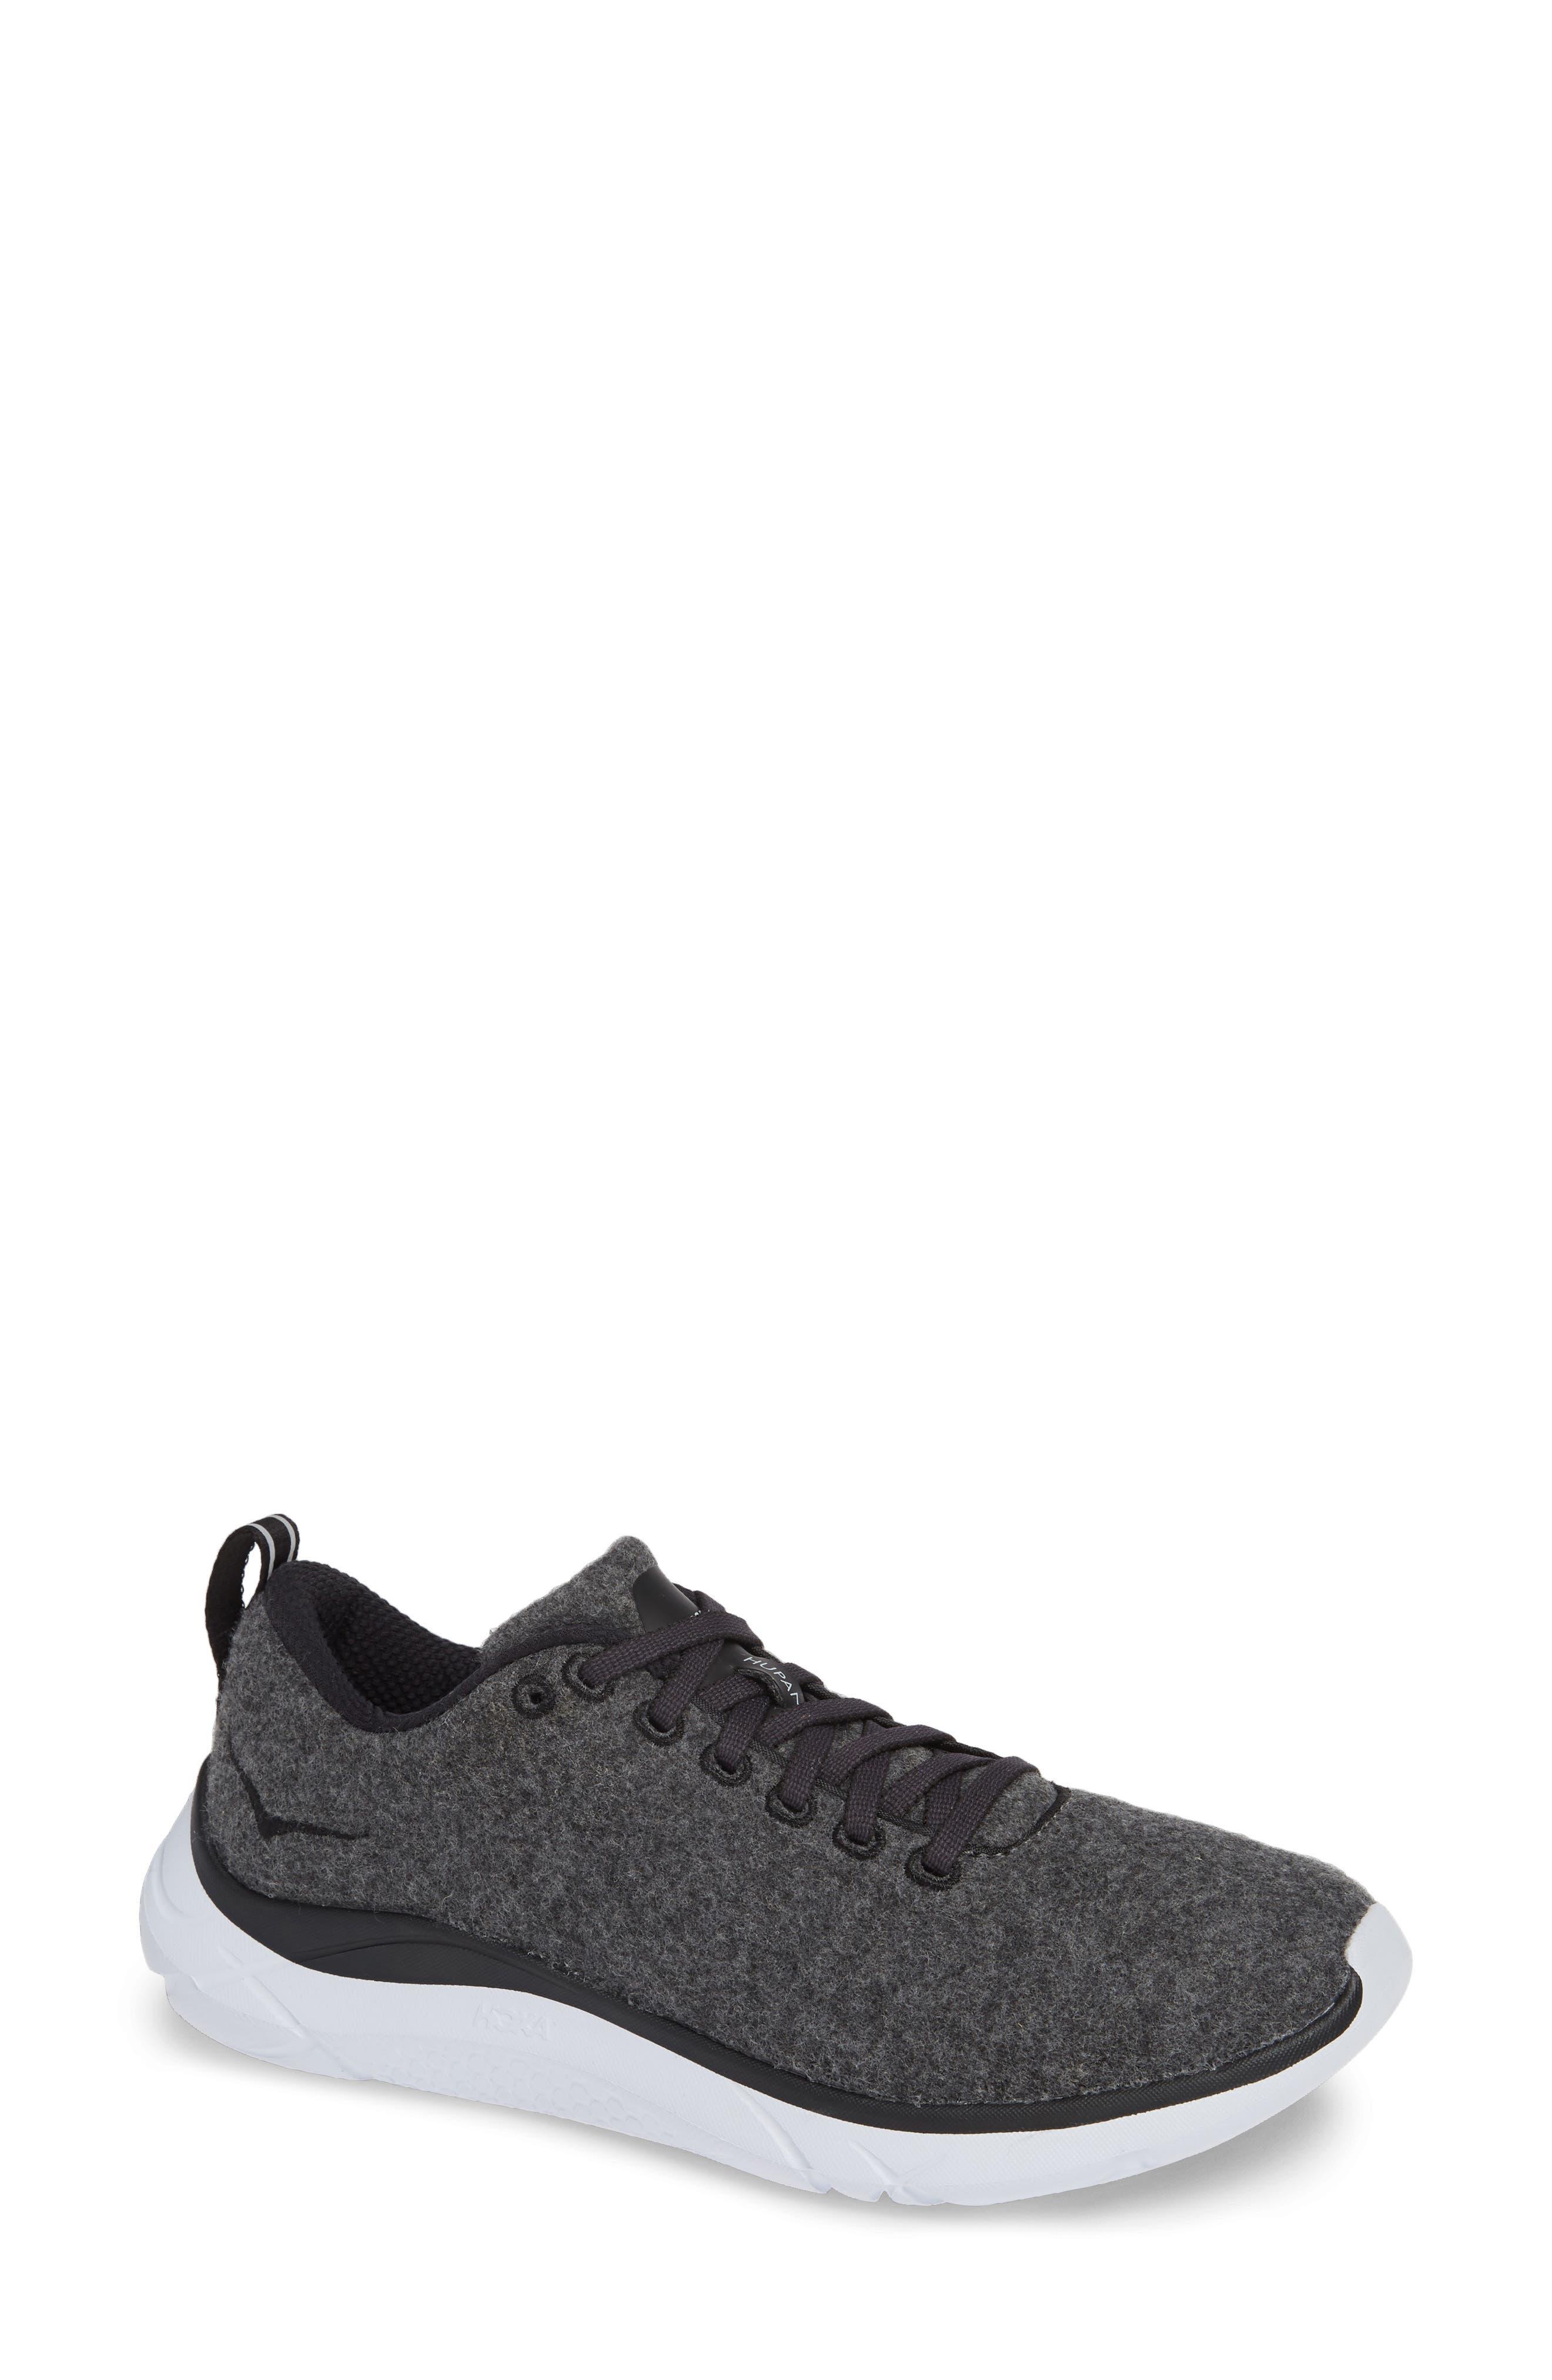 HOKA ONE ONE,                              Hupana Wool Sneaker,                             Main thumbnail 1, color,                             023